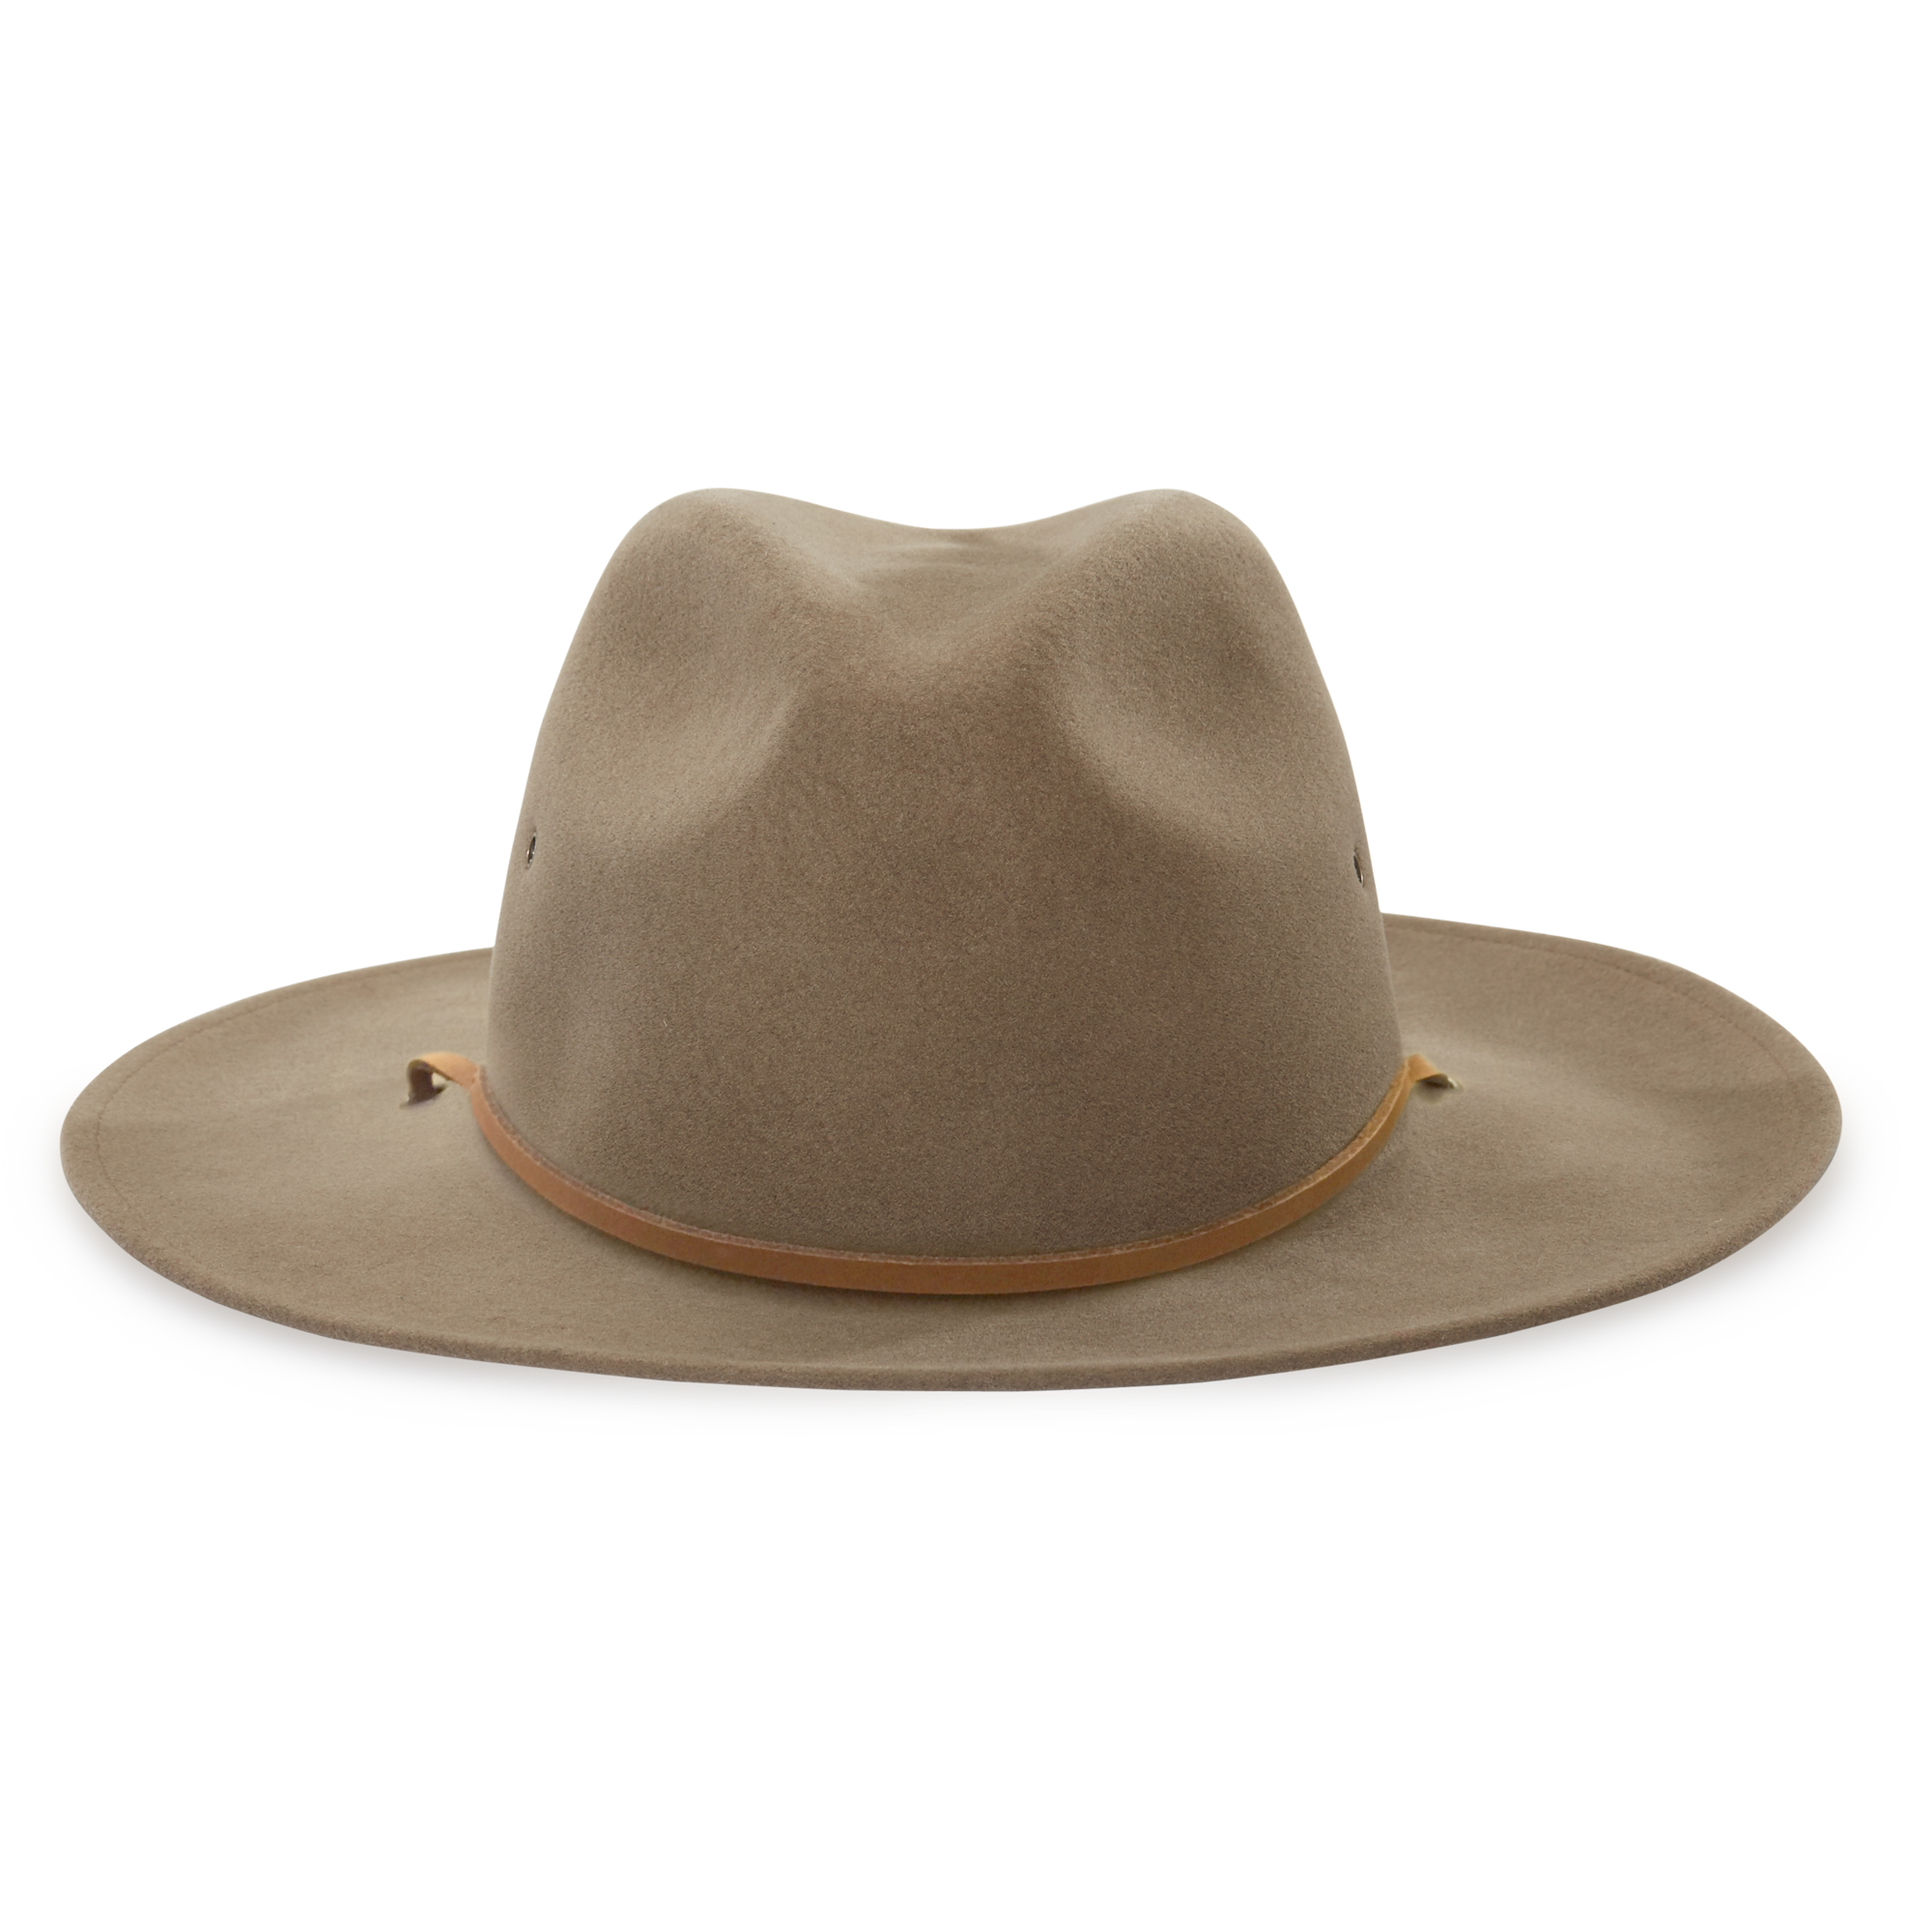 77b66892786 Dr. Clayton Tan Wide Brim Fedora hat front view